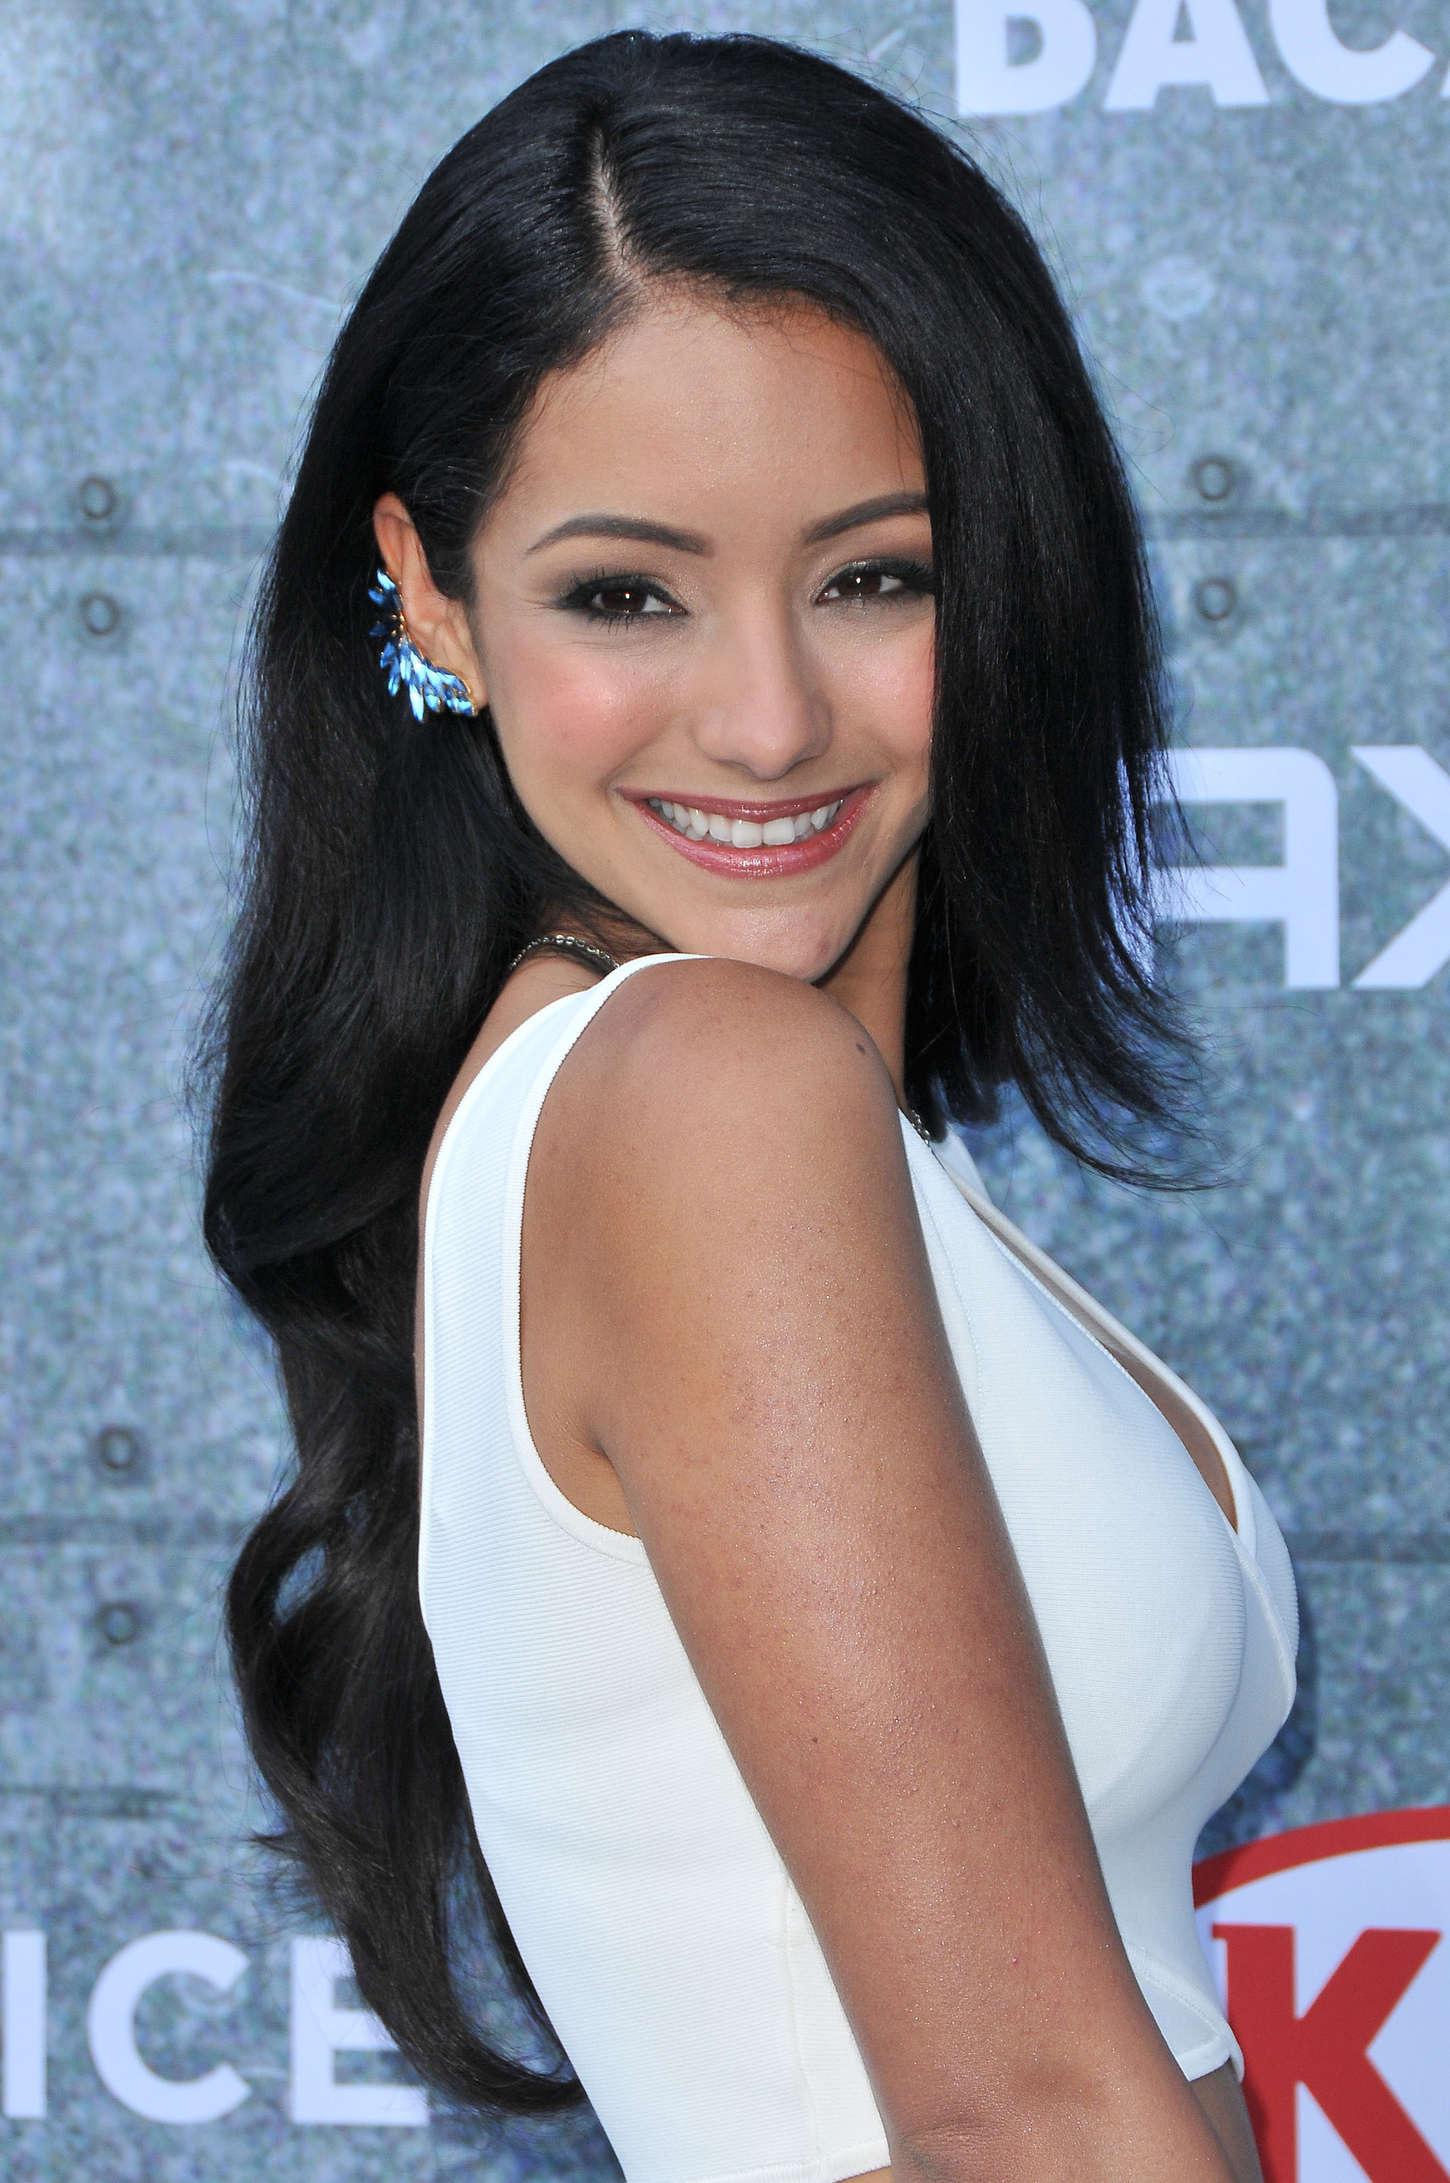 Melanie Iglesias 2015 : Melanie Iglesias: Spike TVs Guys Choice 2015 -24